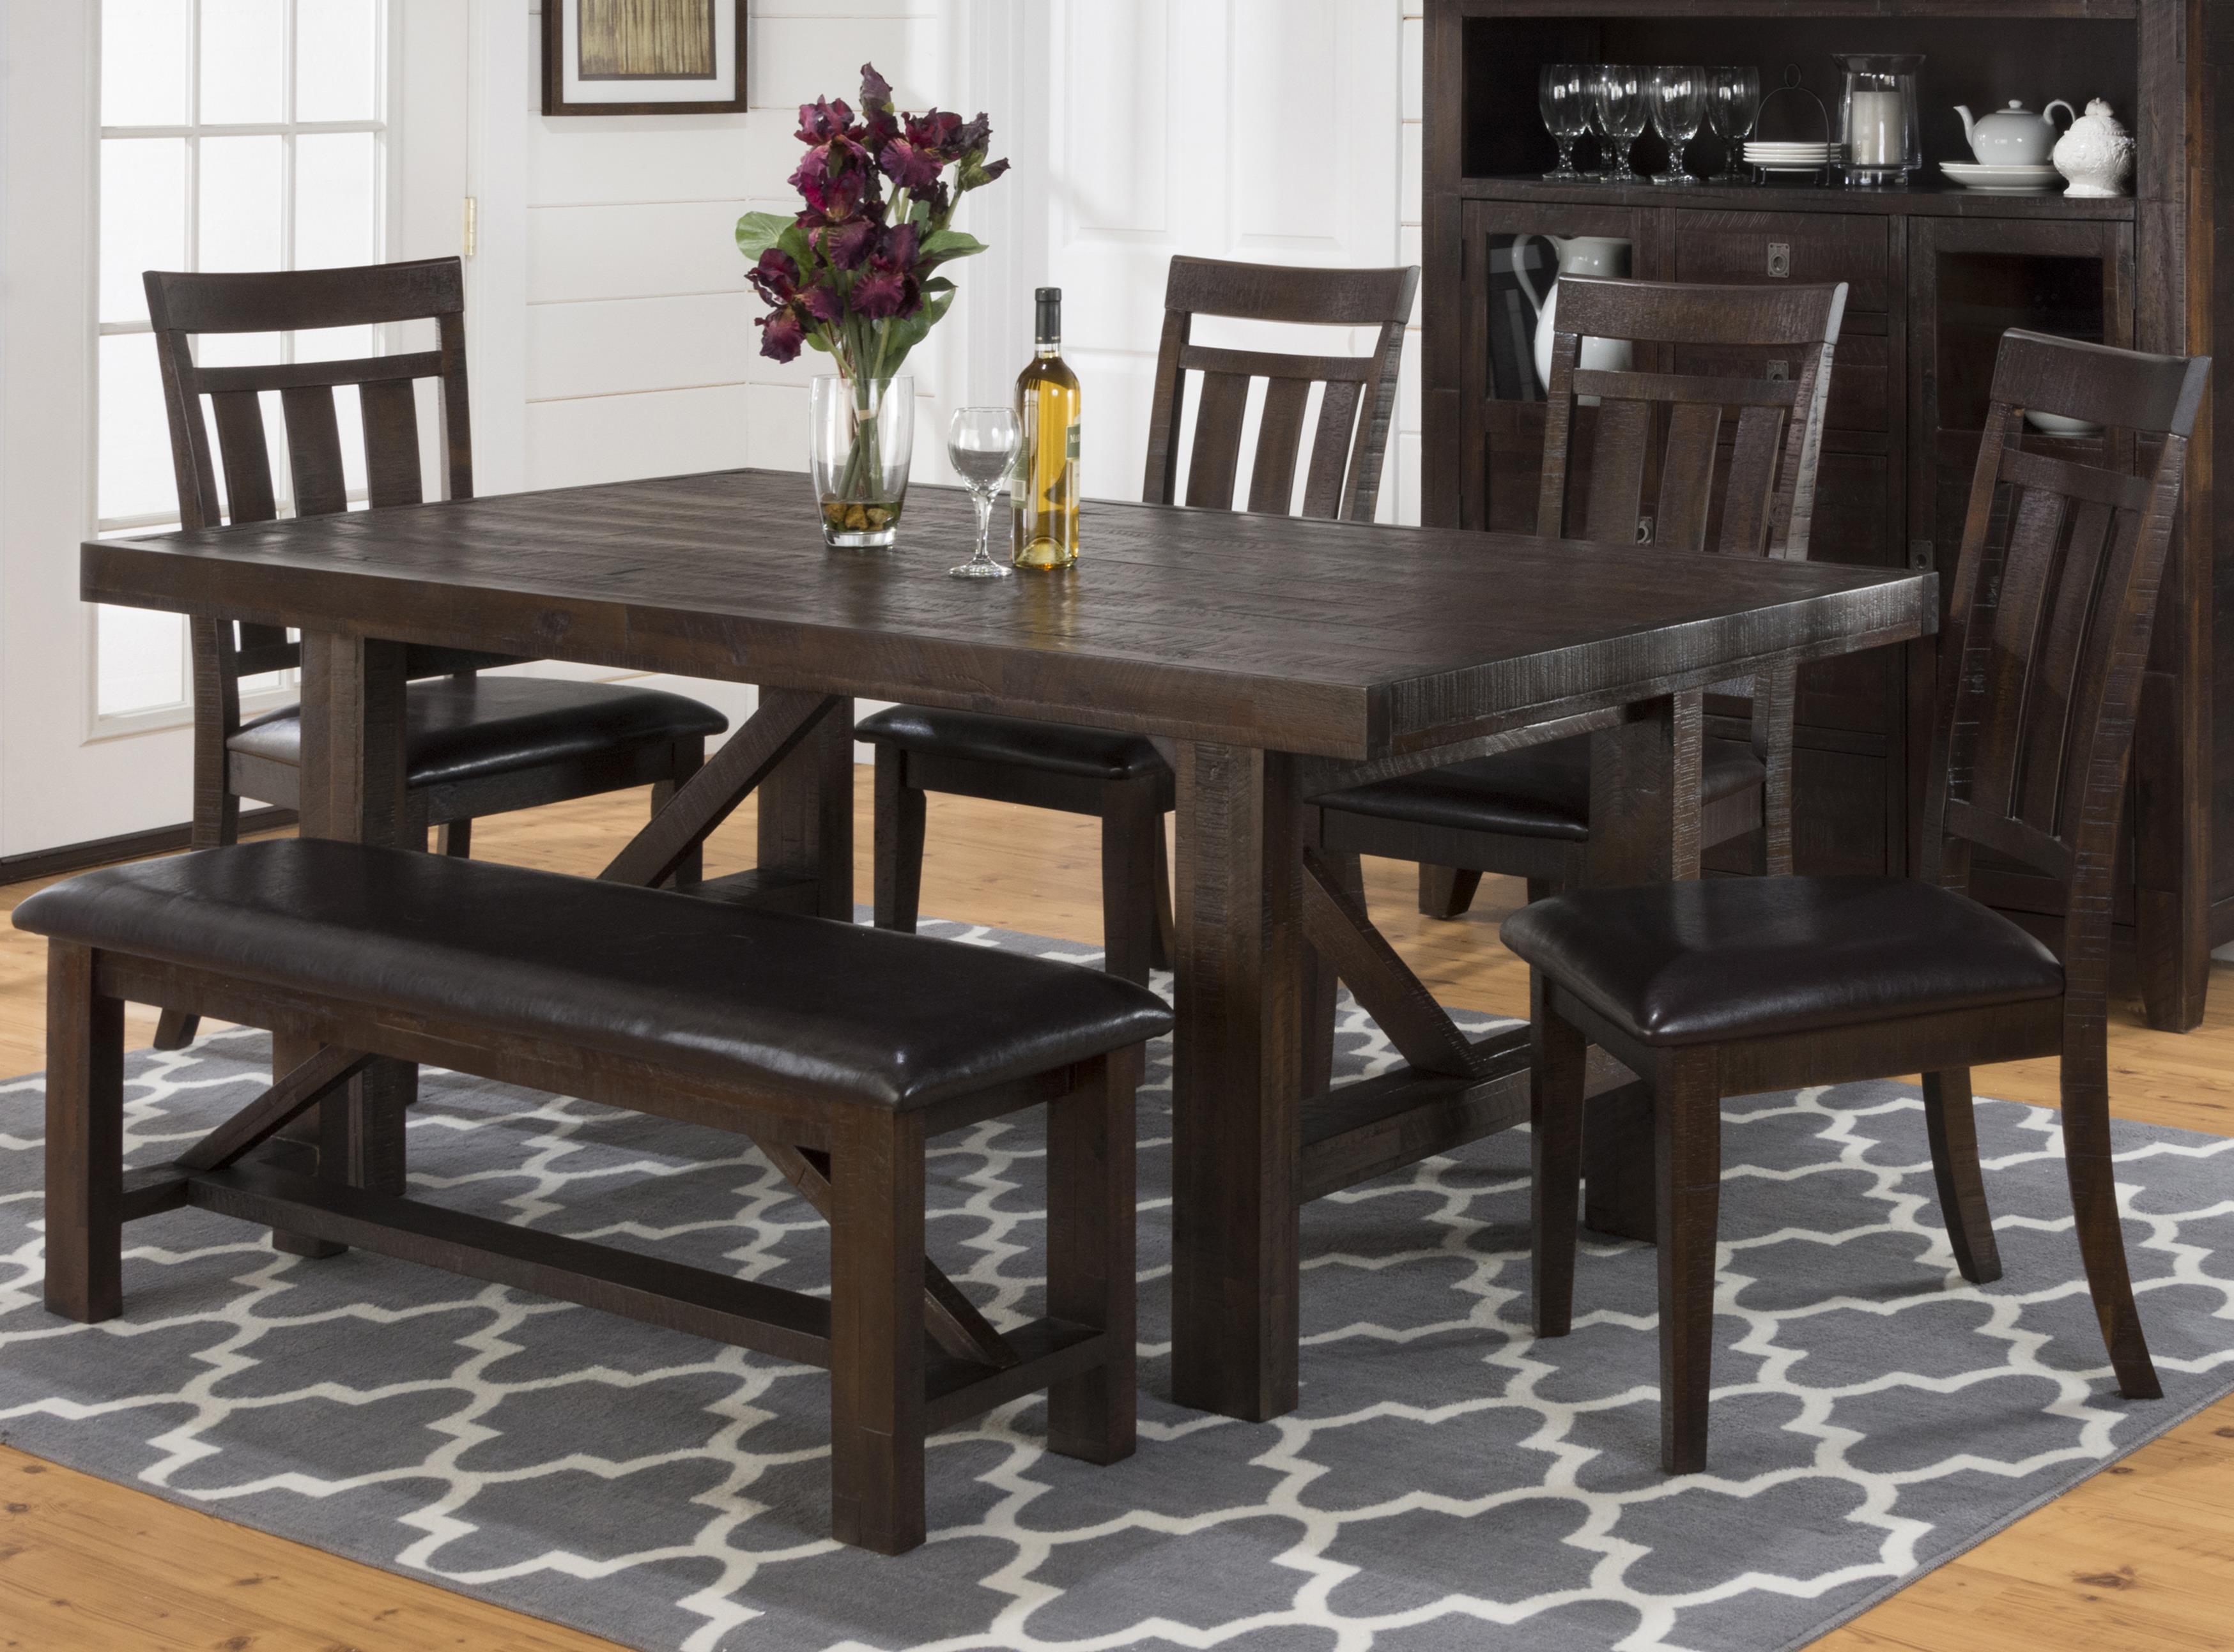 Kona Grove Dining Table, Chair and Bench Set by Jofran at Jofran